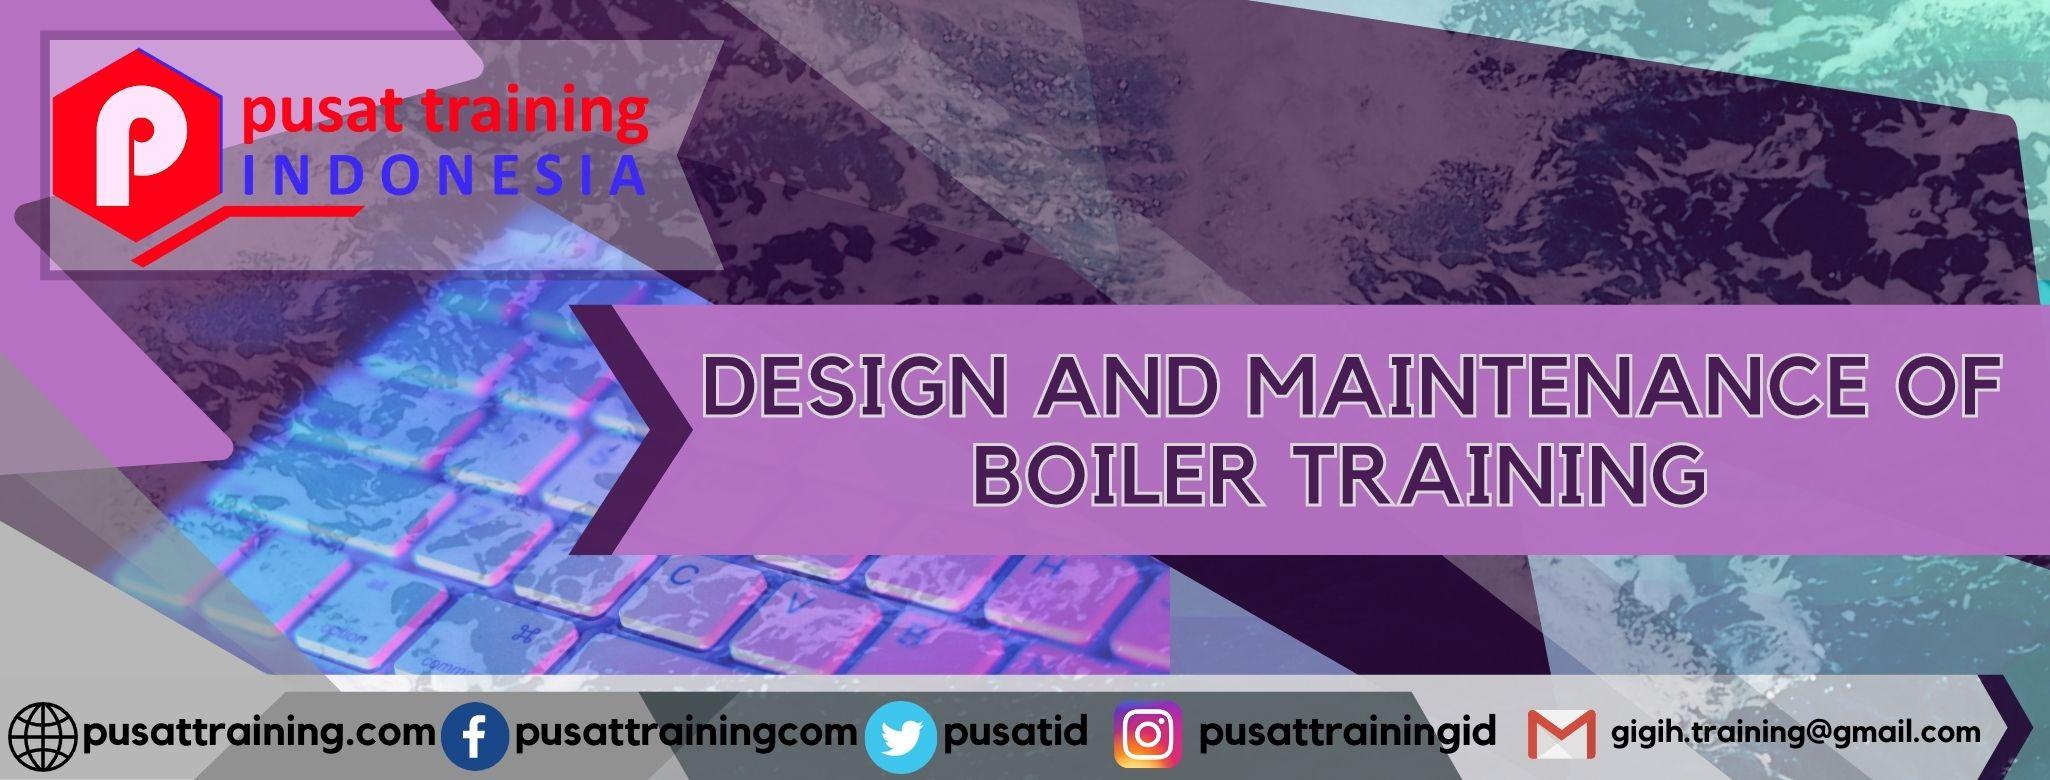 DESIGN AND MAINTENANCE OF BOILER TRAINING